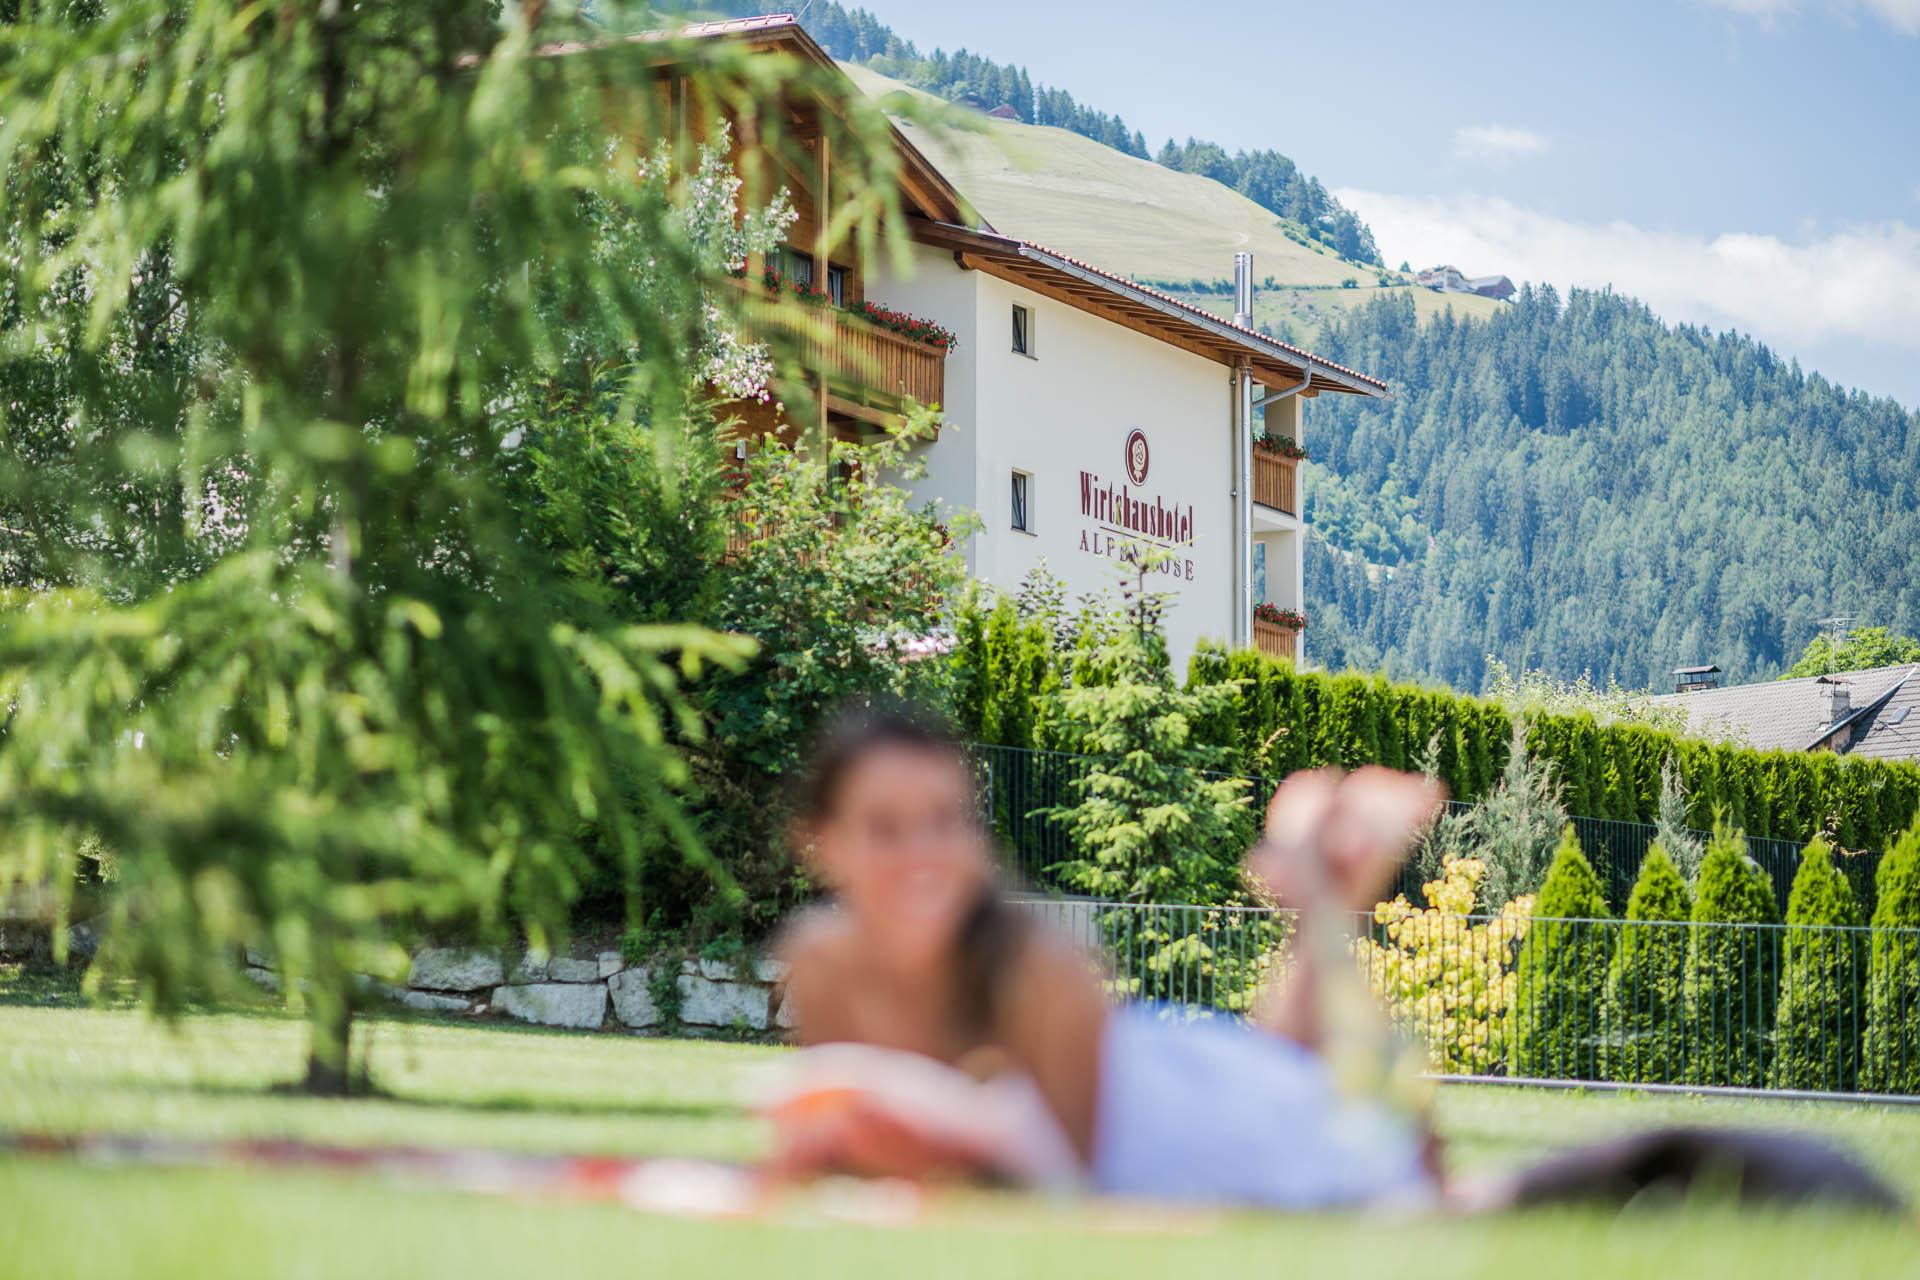 Our Hotel Wirtshaushotel Alpenrose